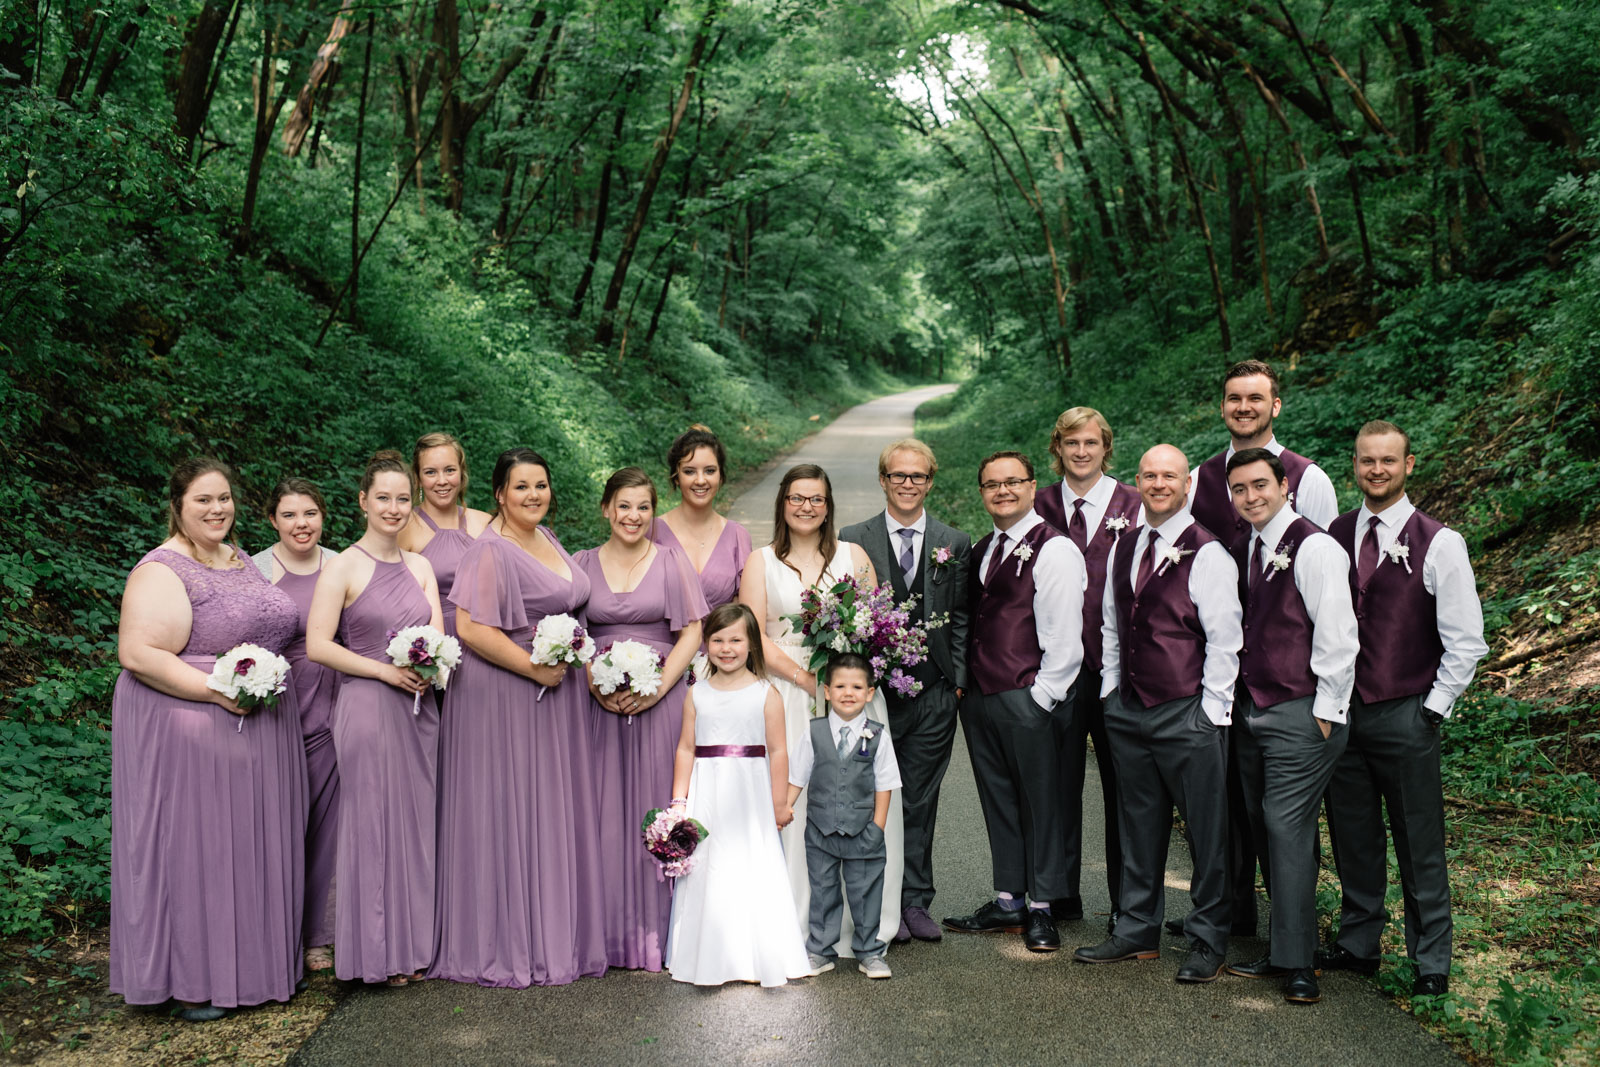 bridal party waverly june wedding